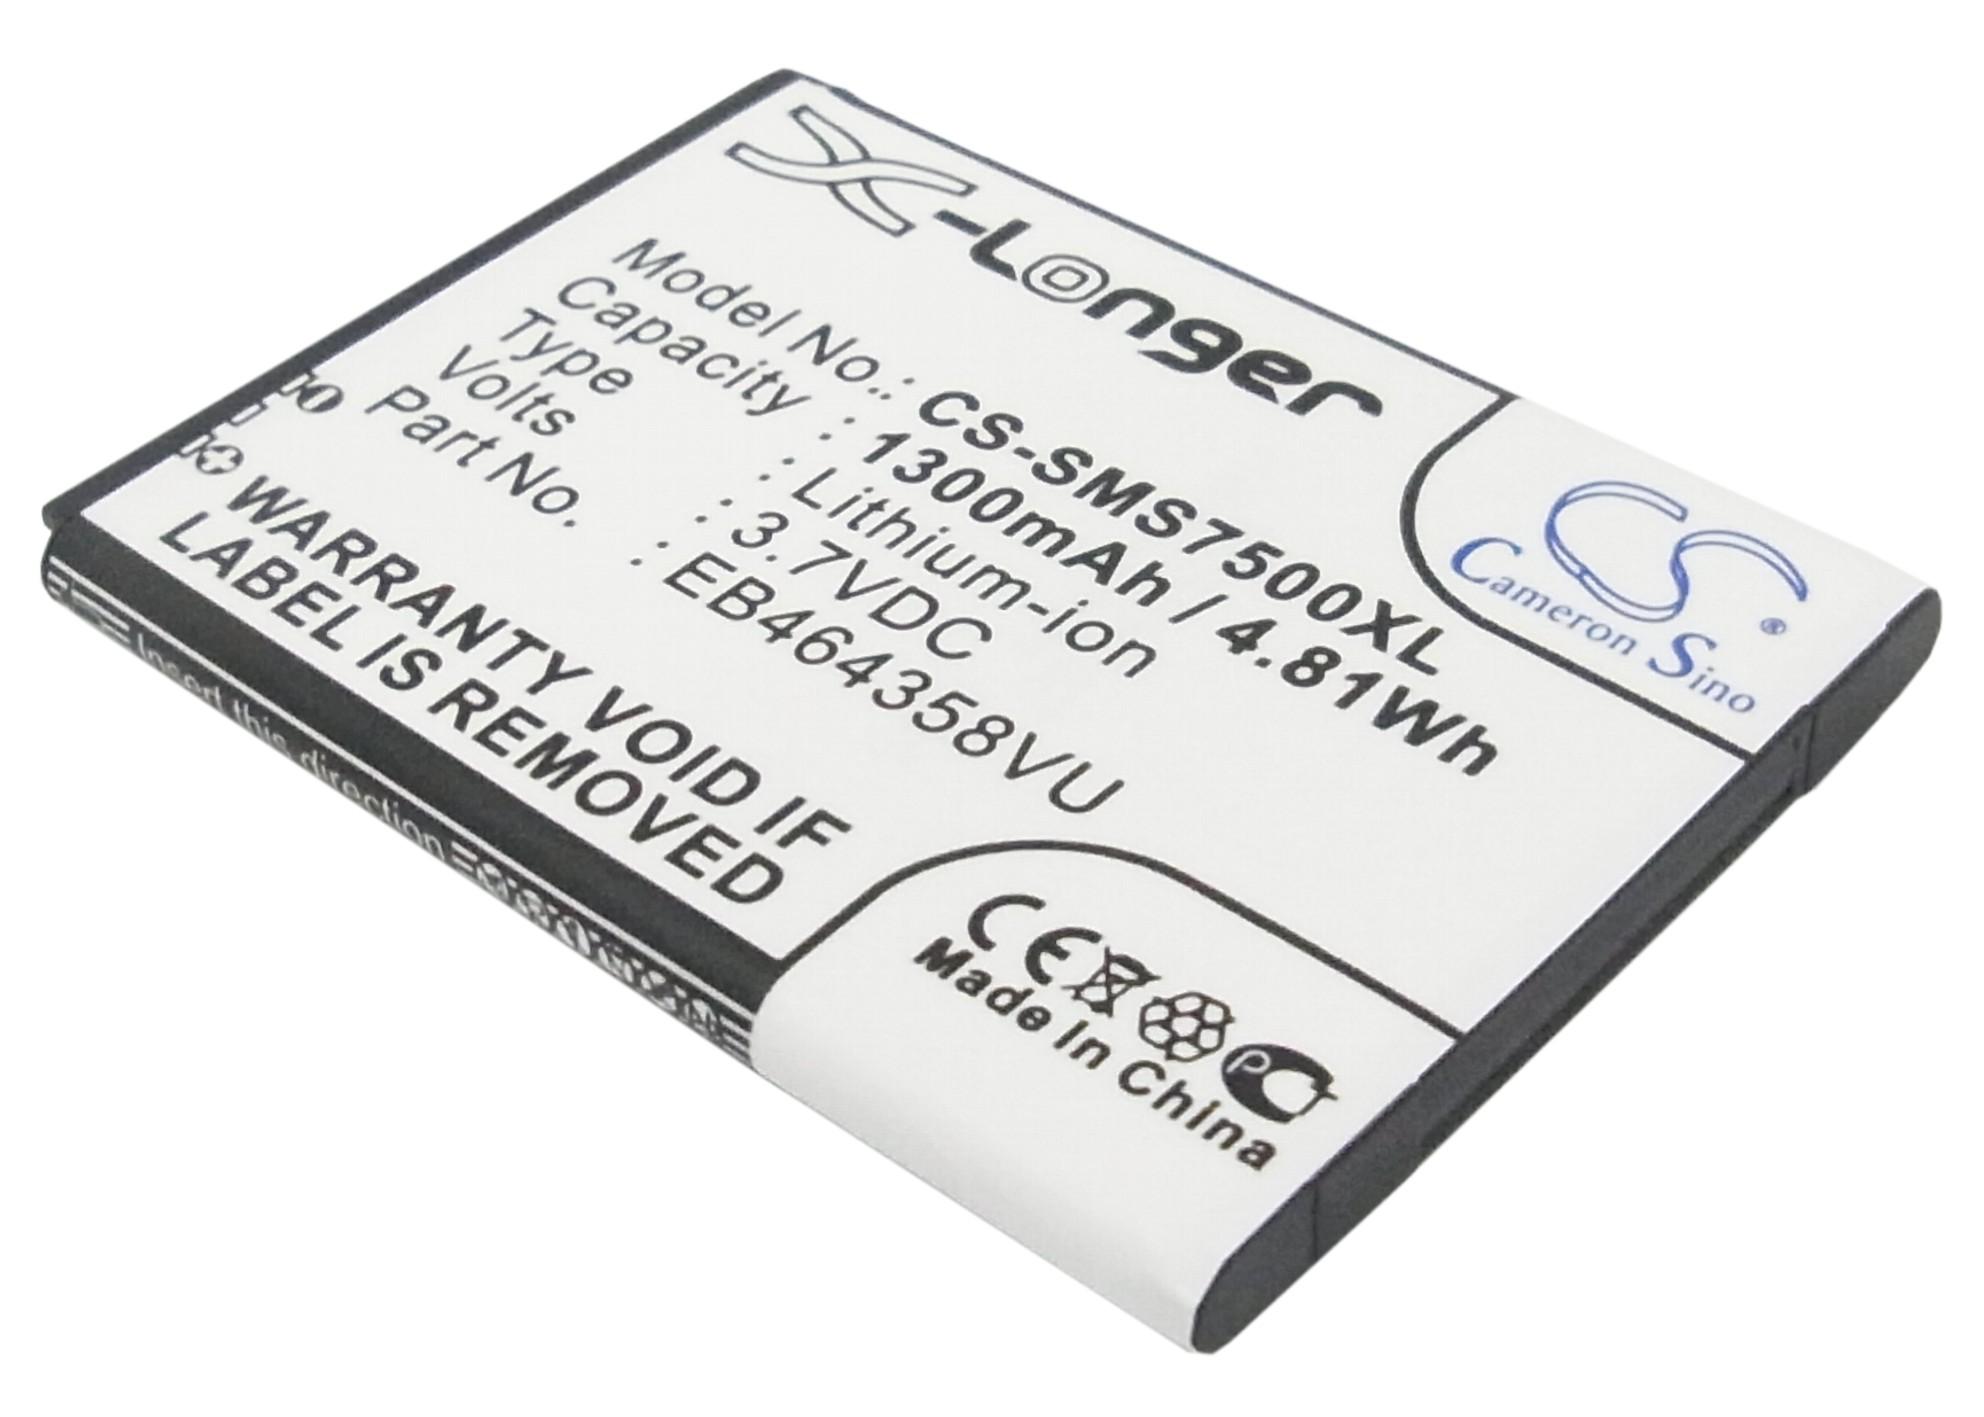 Cameron Sino baterie do mobilů pro SAMSUNG GT-S7500 3.7V Li-ion 1300mAh černá - neoriginální